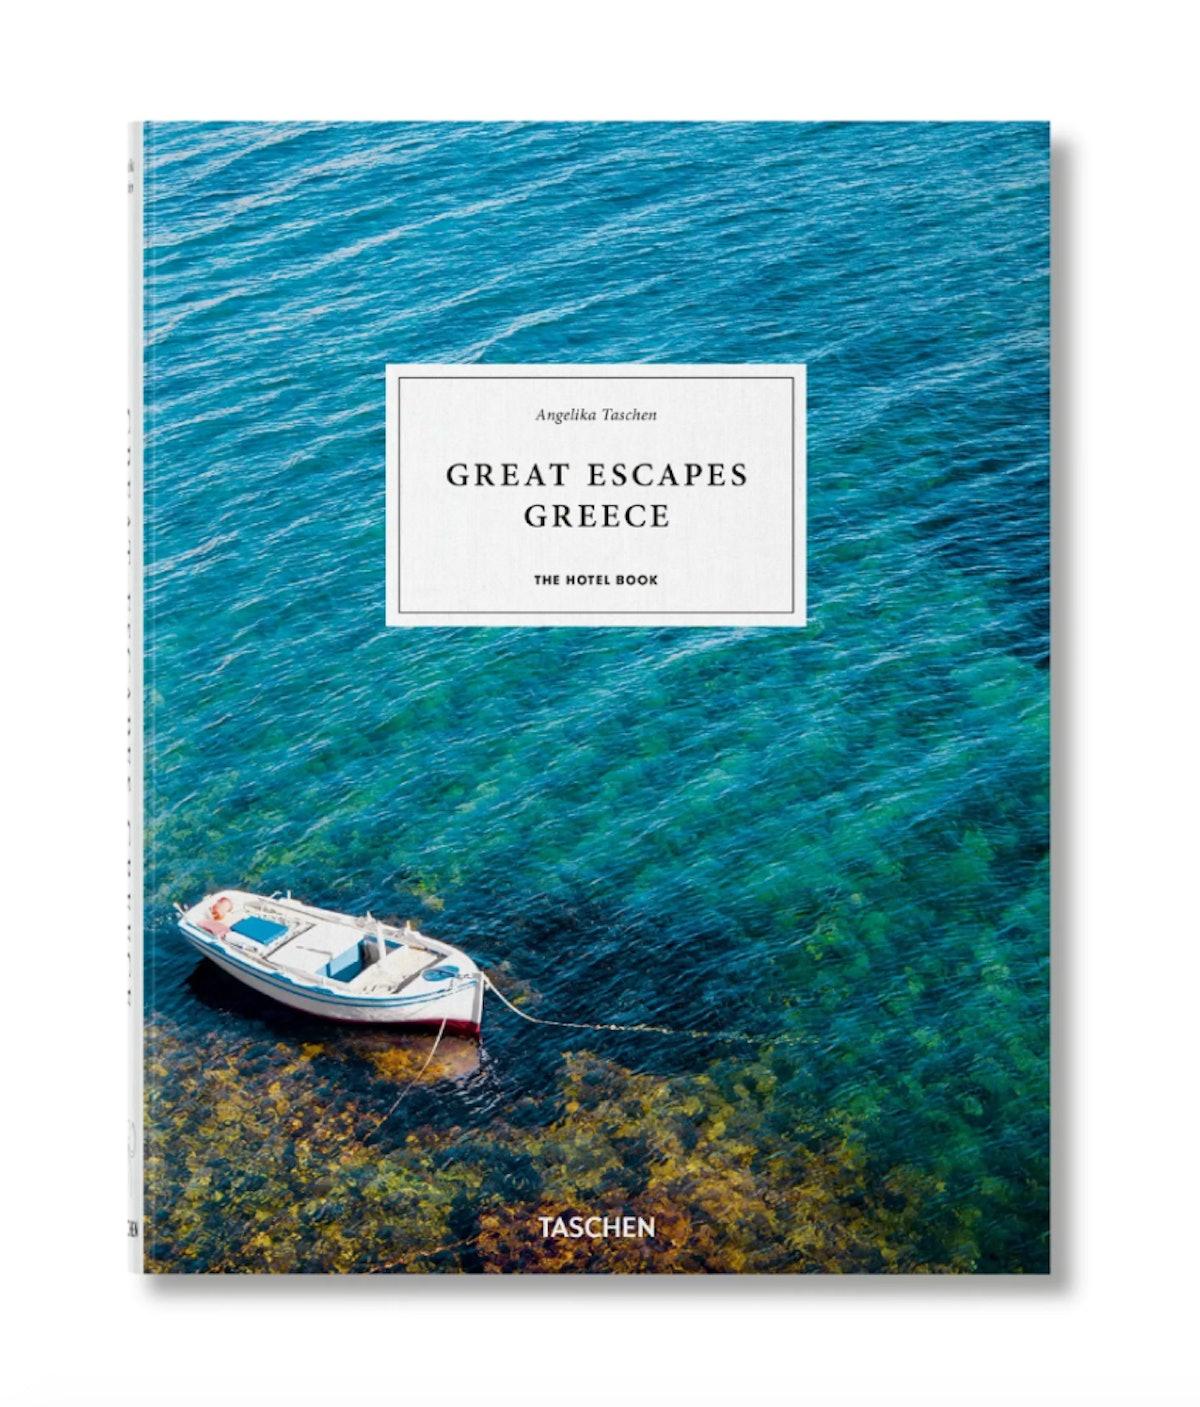 'Great Escapes: Greece' Book